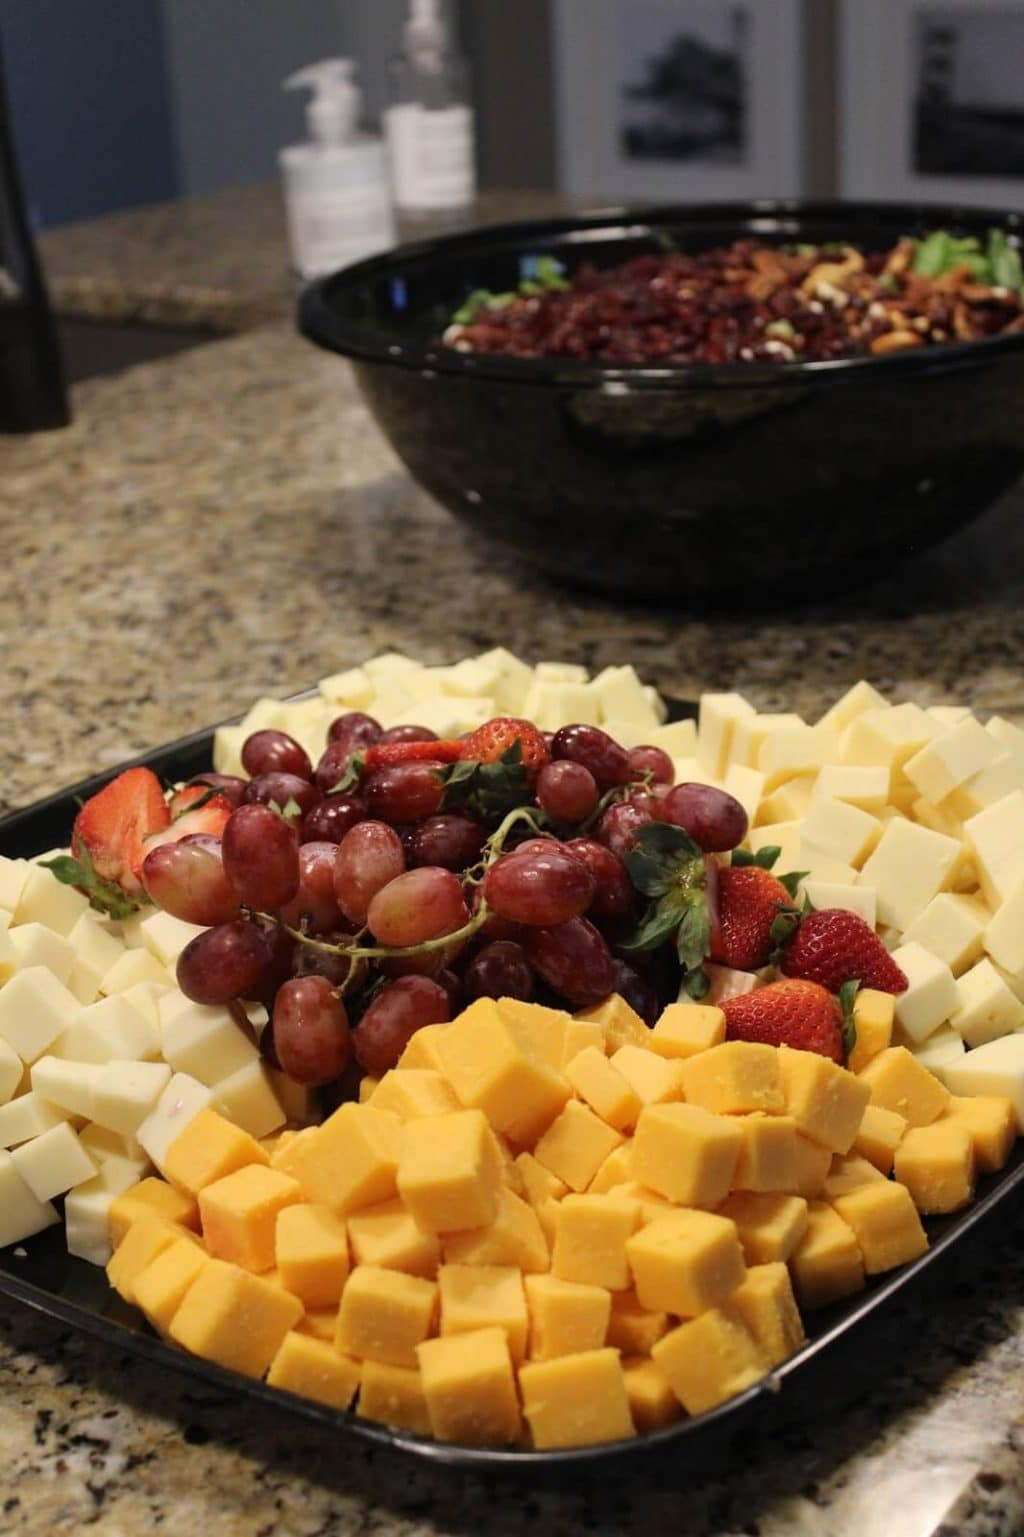 Fruit, veggies, salad, Thanksgiving catering, whole foods lake norman